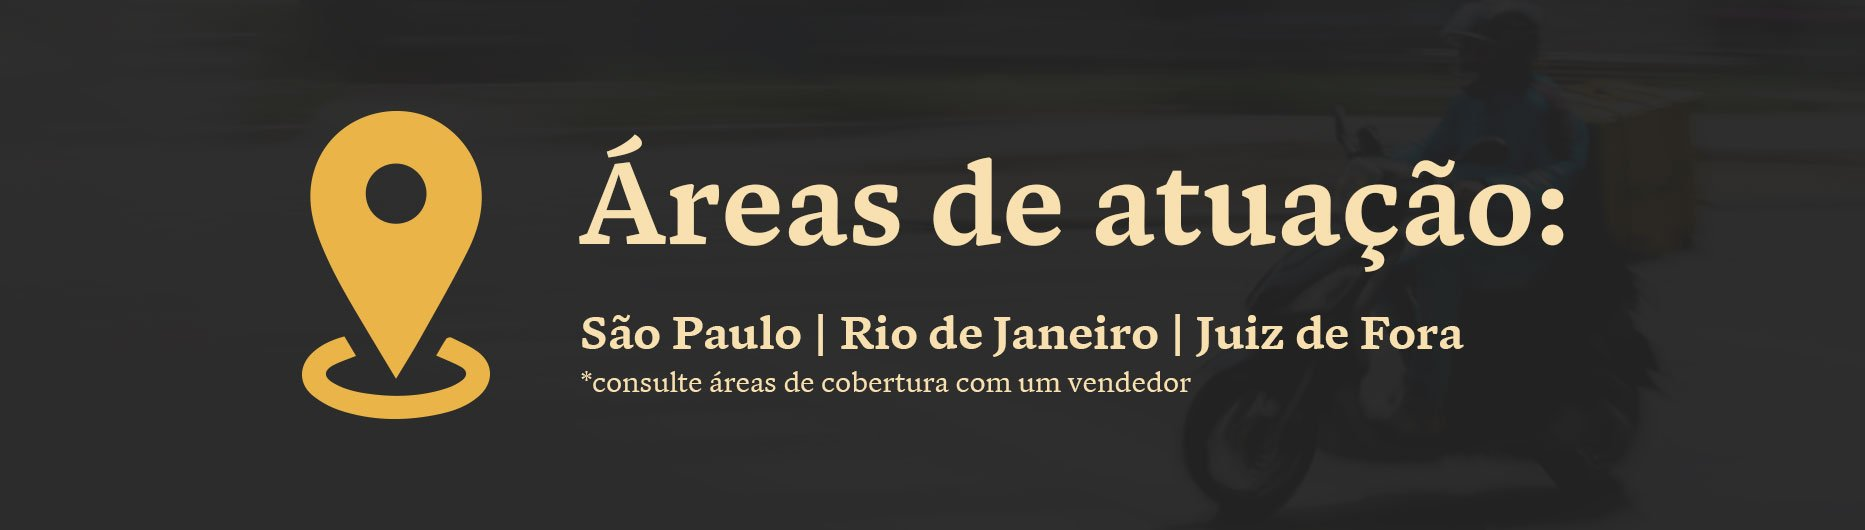 AREAS DE ATENDIMENTO